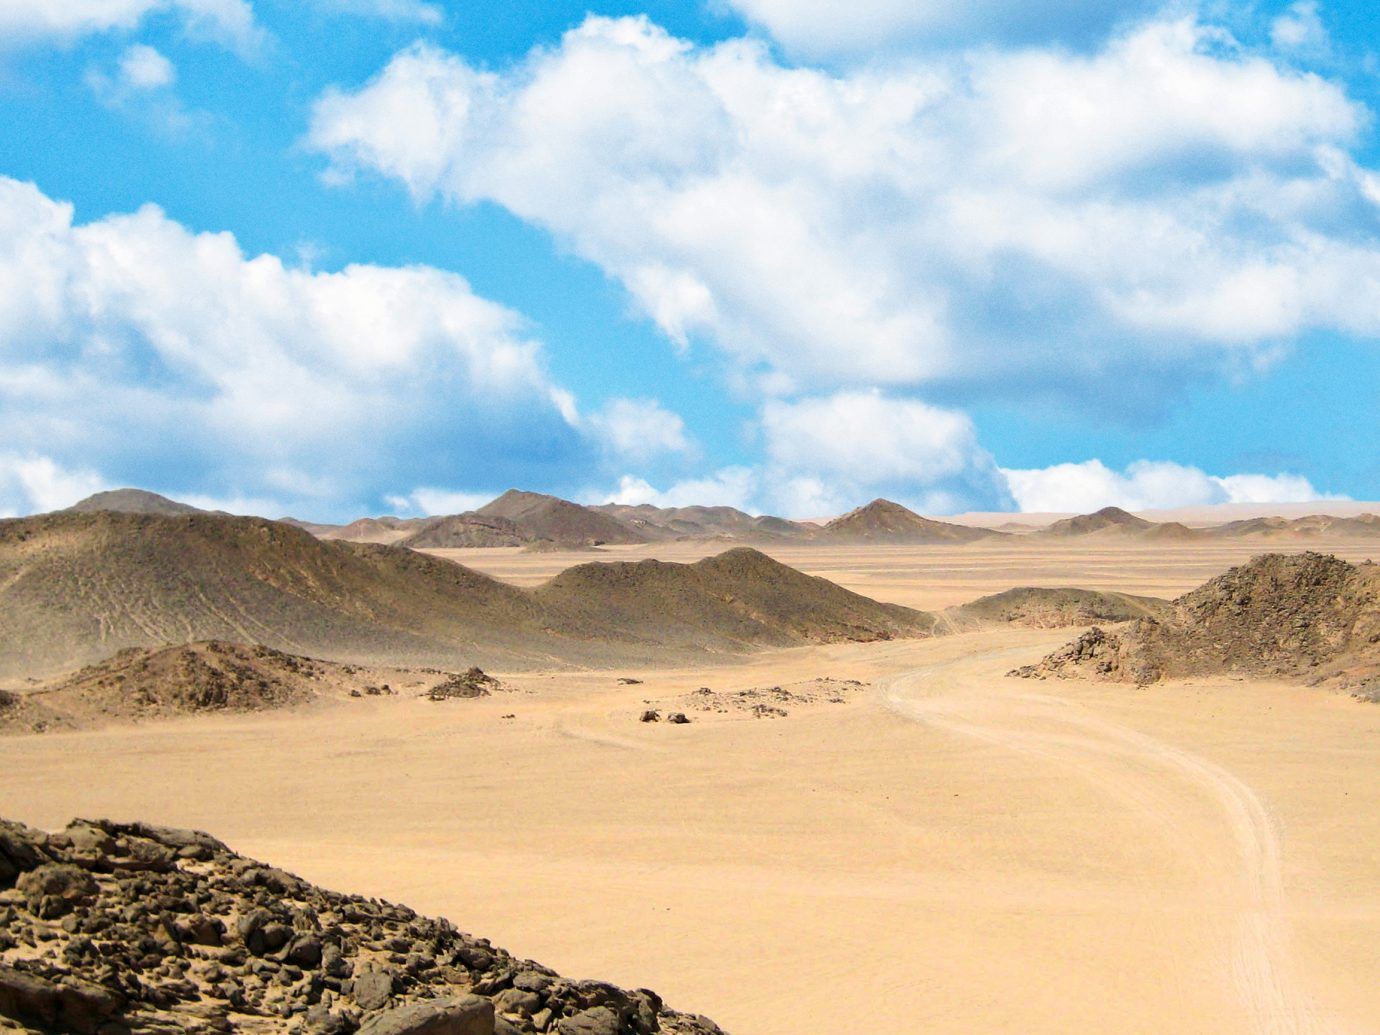 India Jaipur Jodhpur Trip Ideas sky cloud ecosystem aeolian landform Desert sand ecoregion landscape plateau wadi geology hill mountain meteorological phenomenon plain steppe